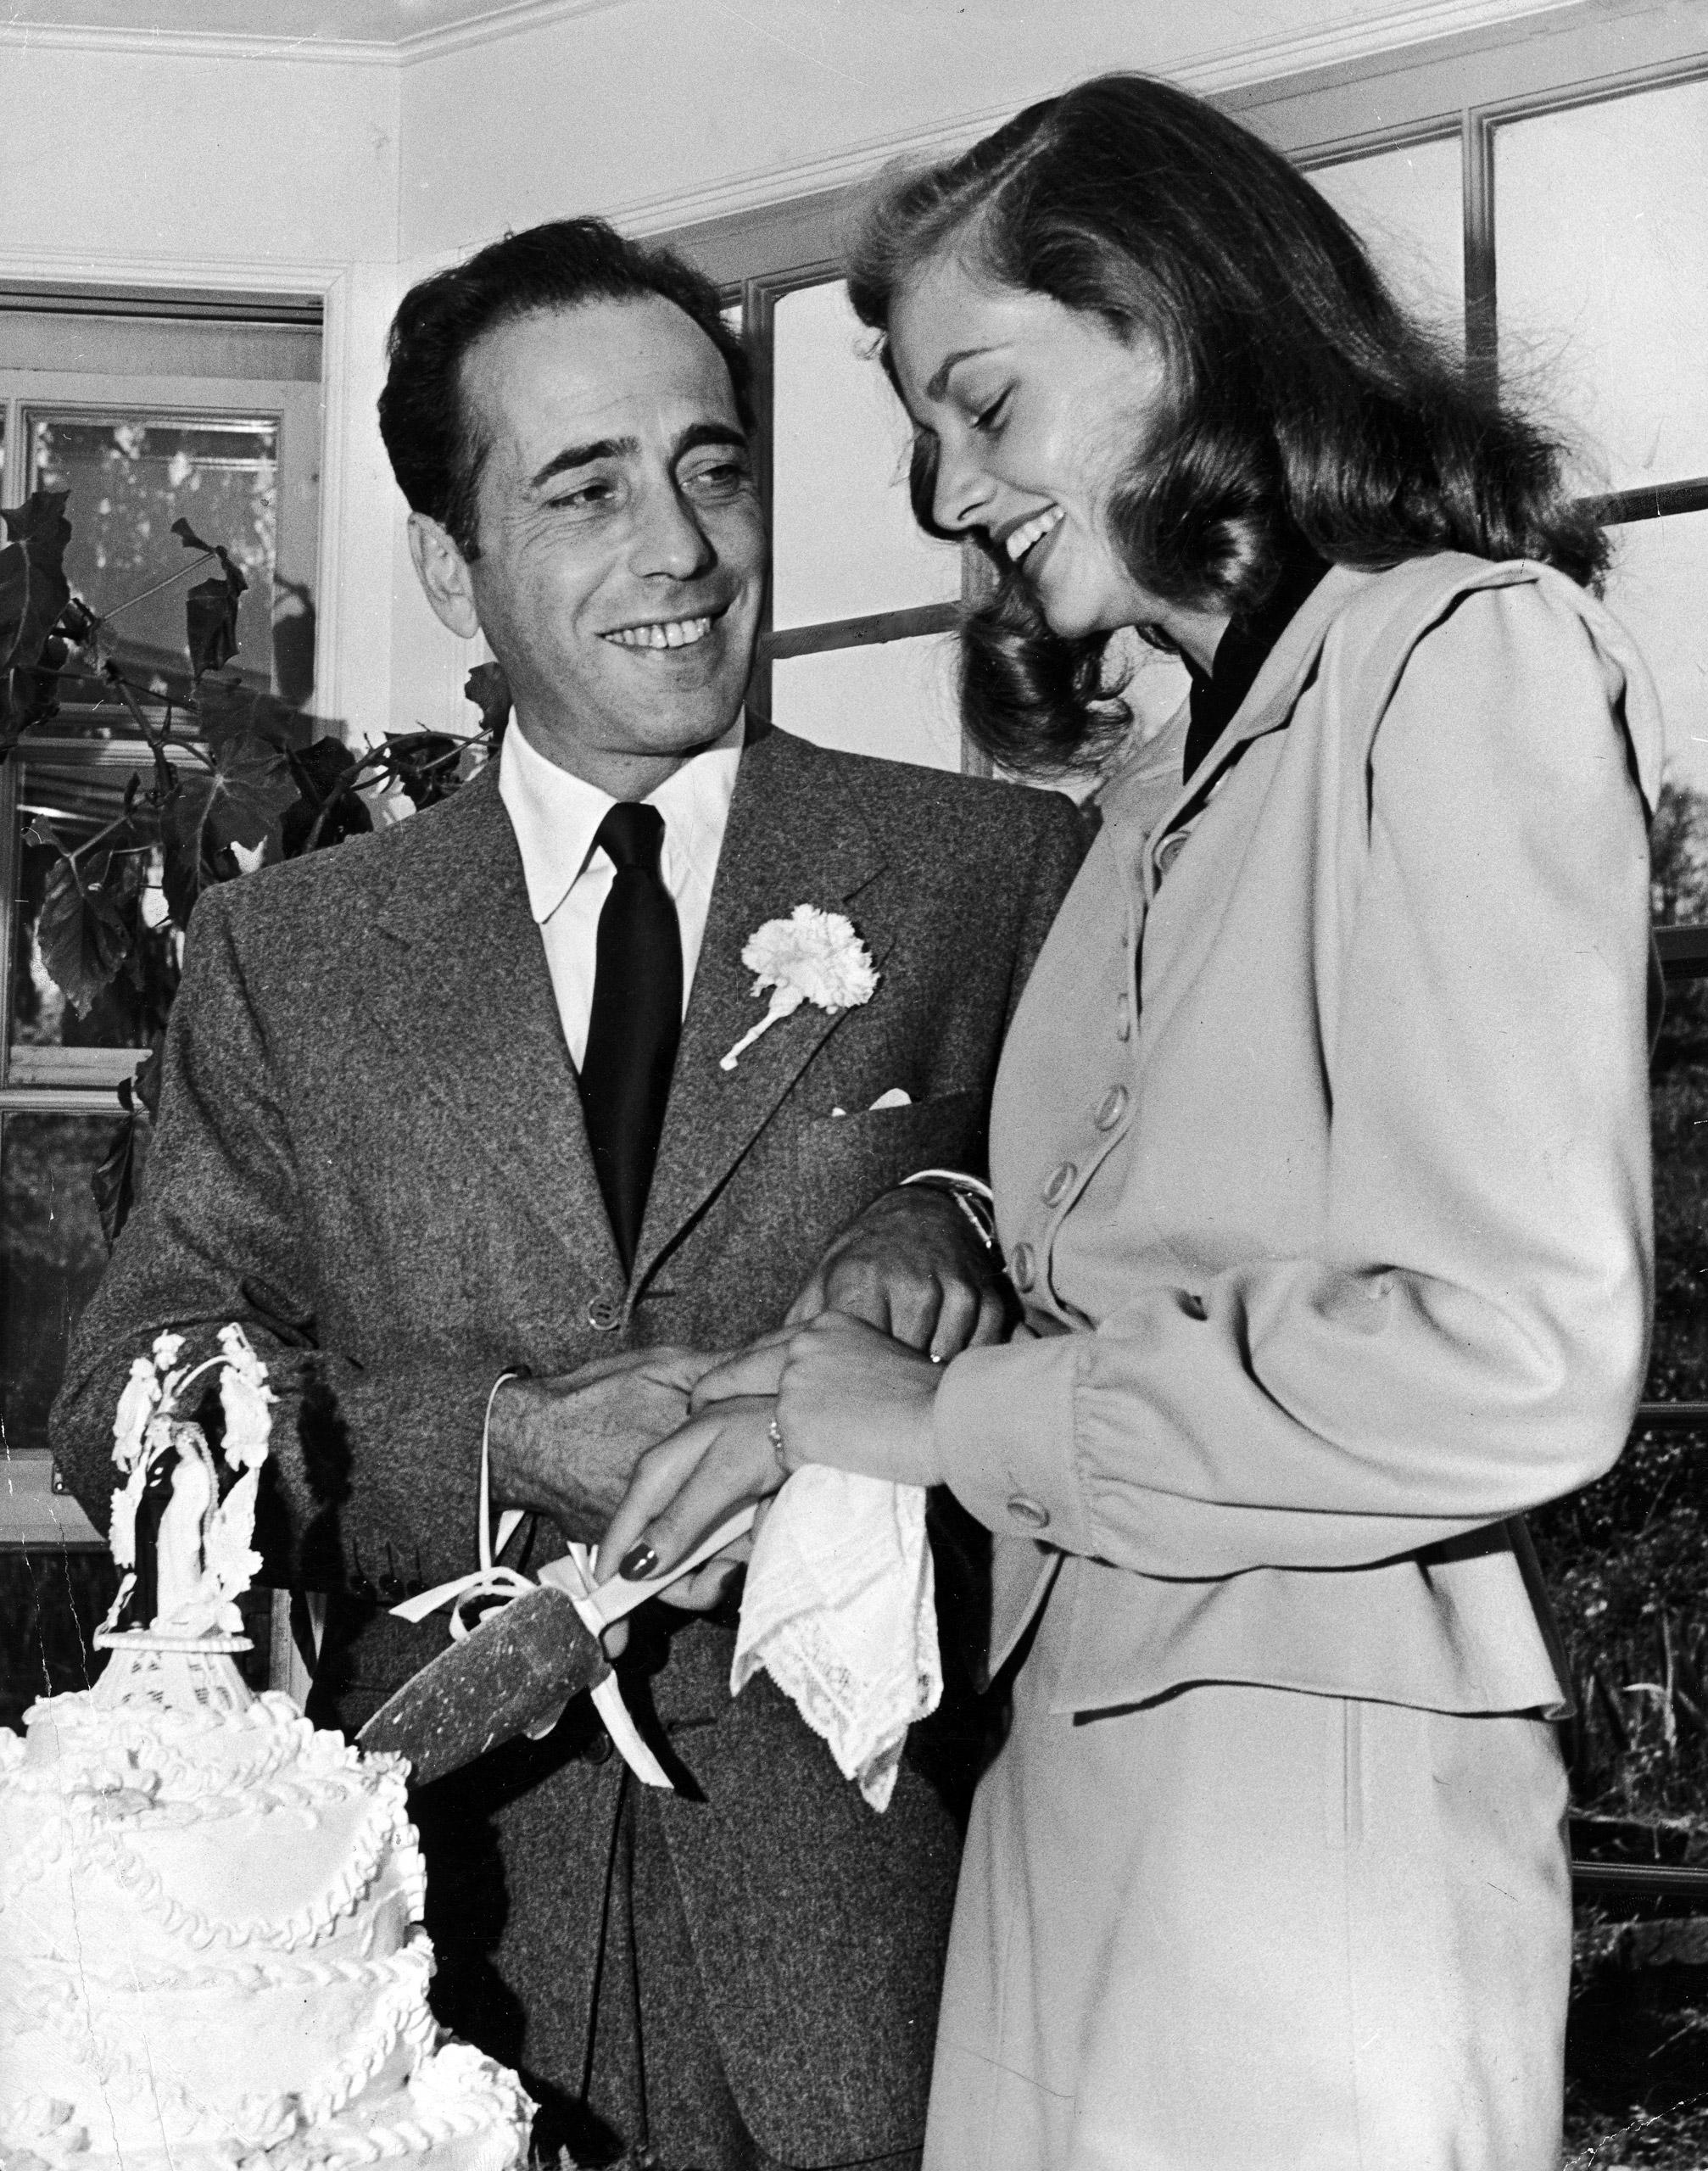 Bogart and Bacall cut the wedding cake.